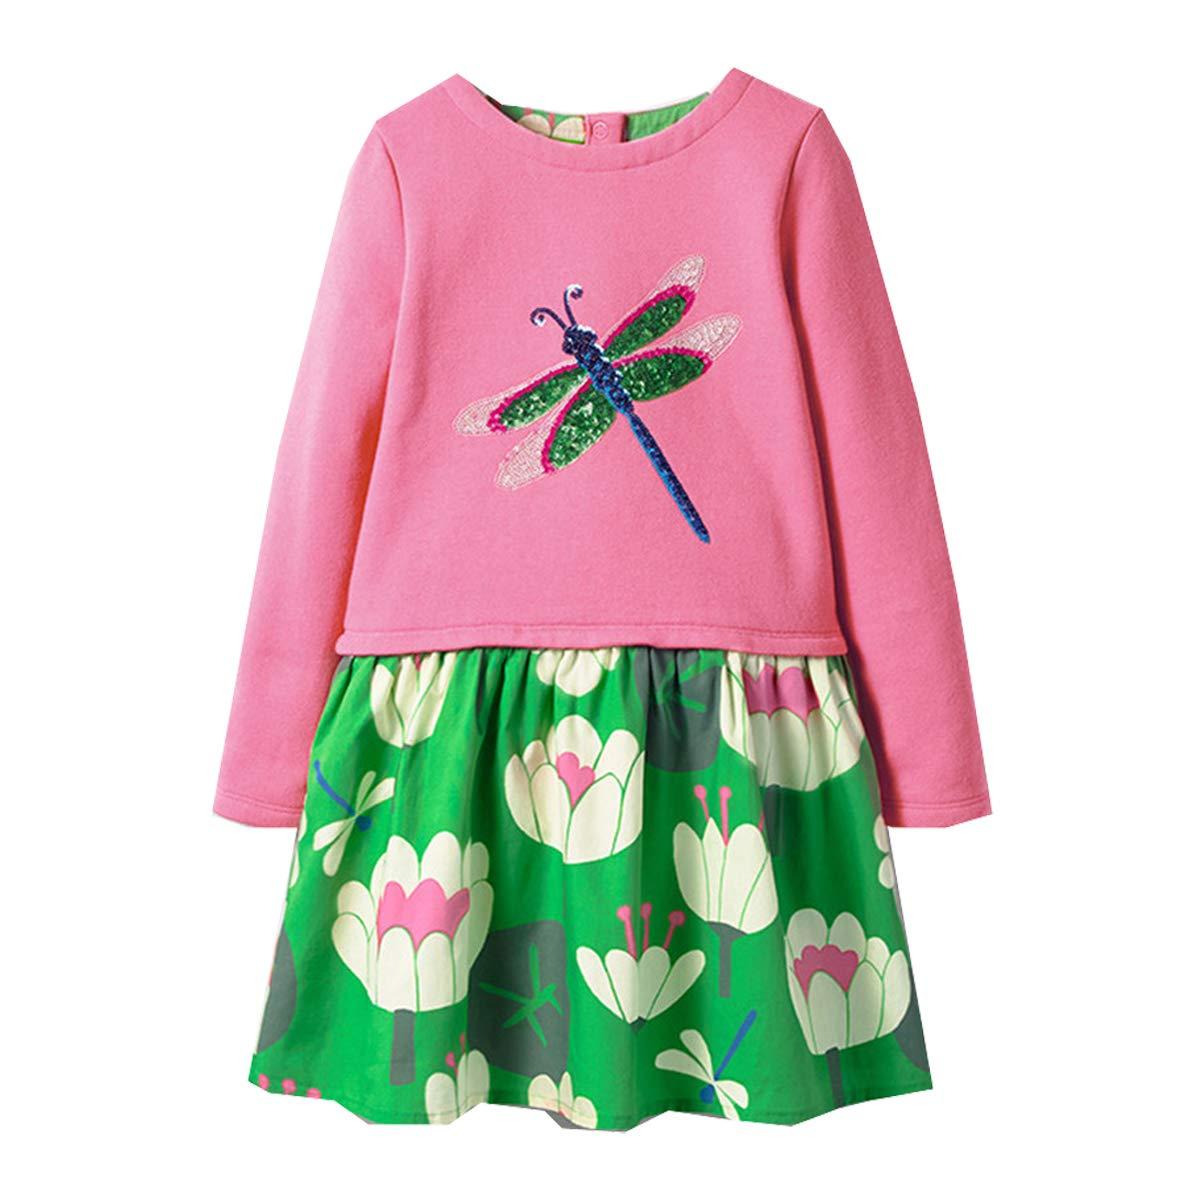 VIKITA Toddler Girl Long Sleeve Dragonfly Pink Dress Baby Girls Winter Birthday Dresses Great Gift (6T, MS0361)